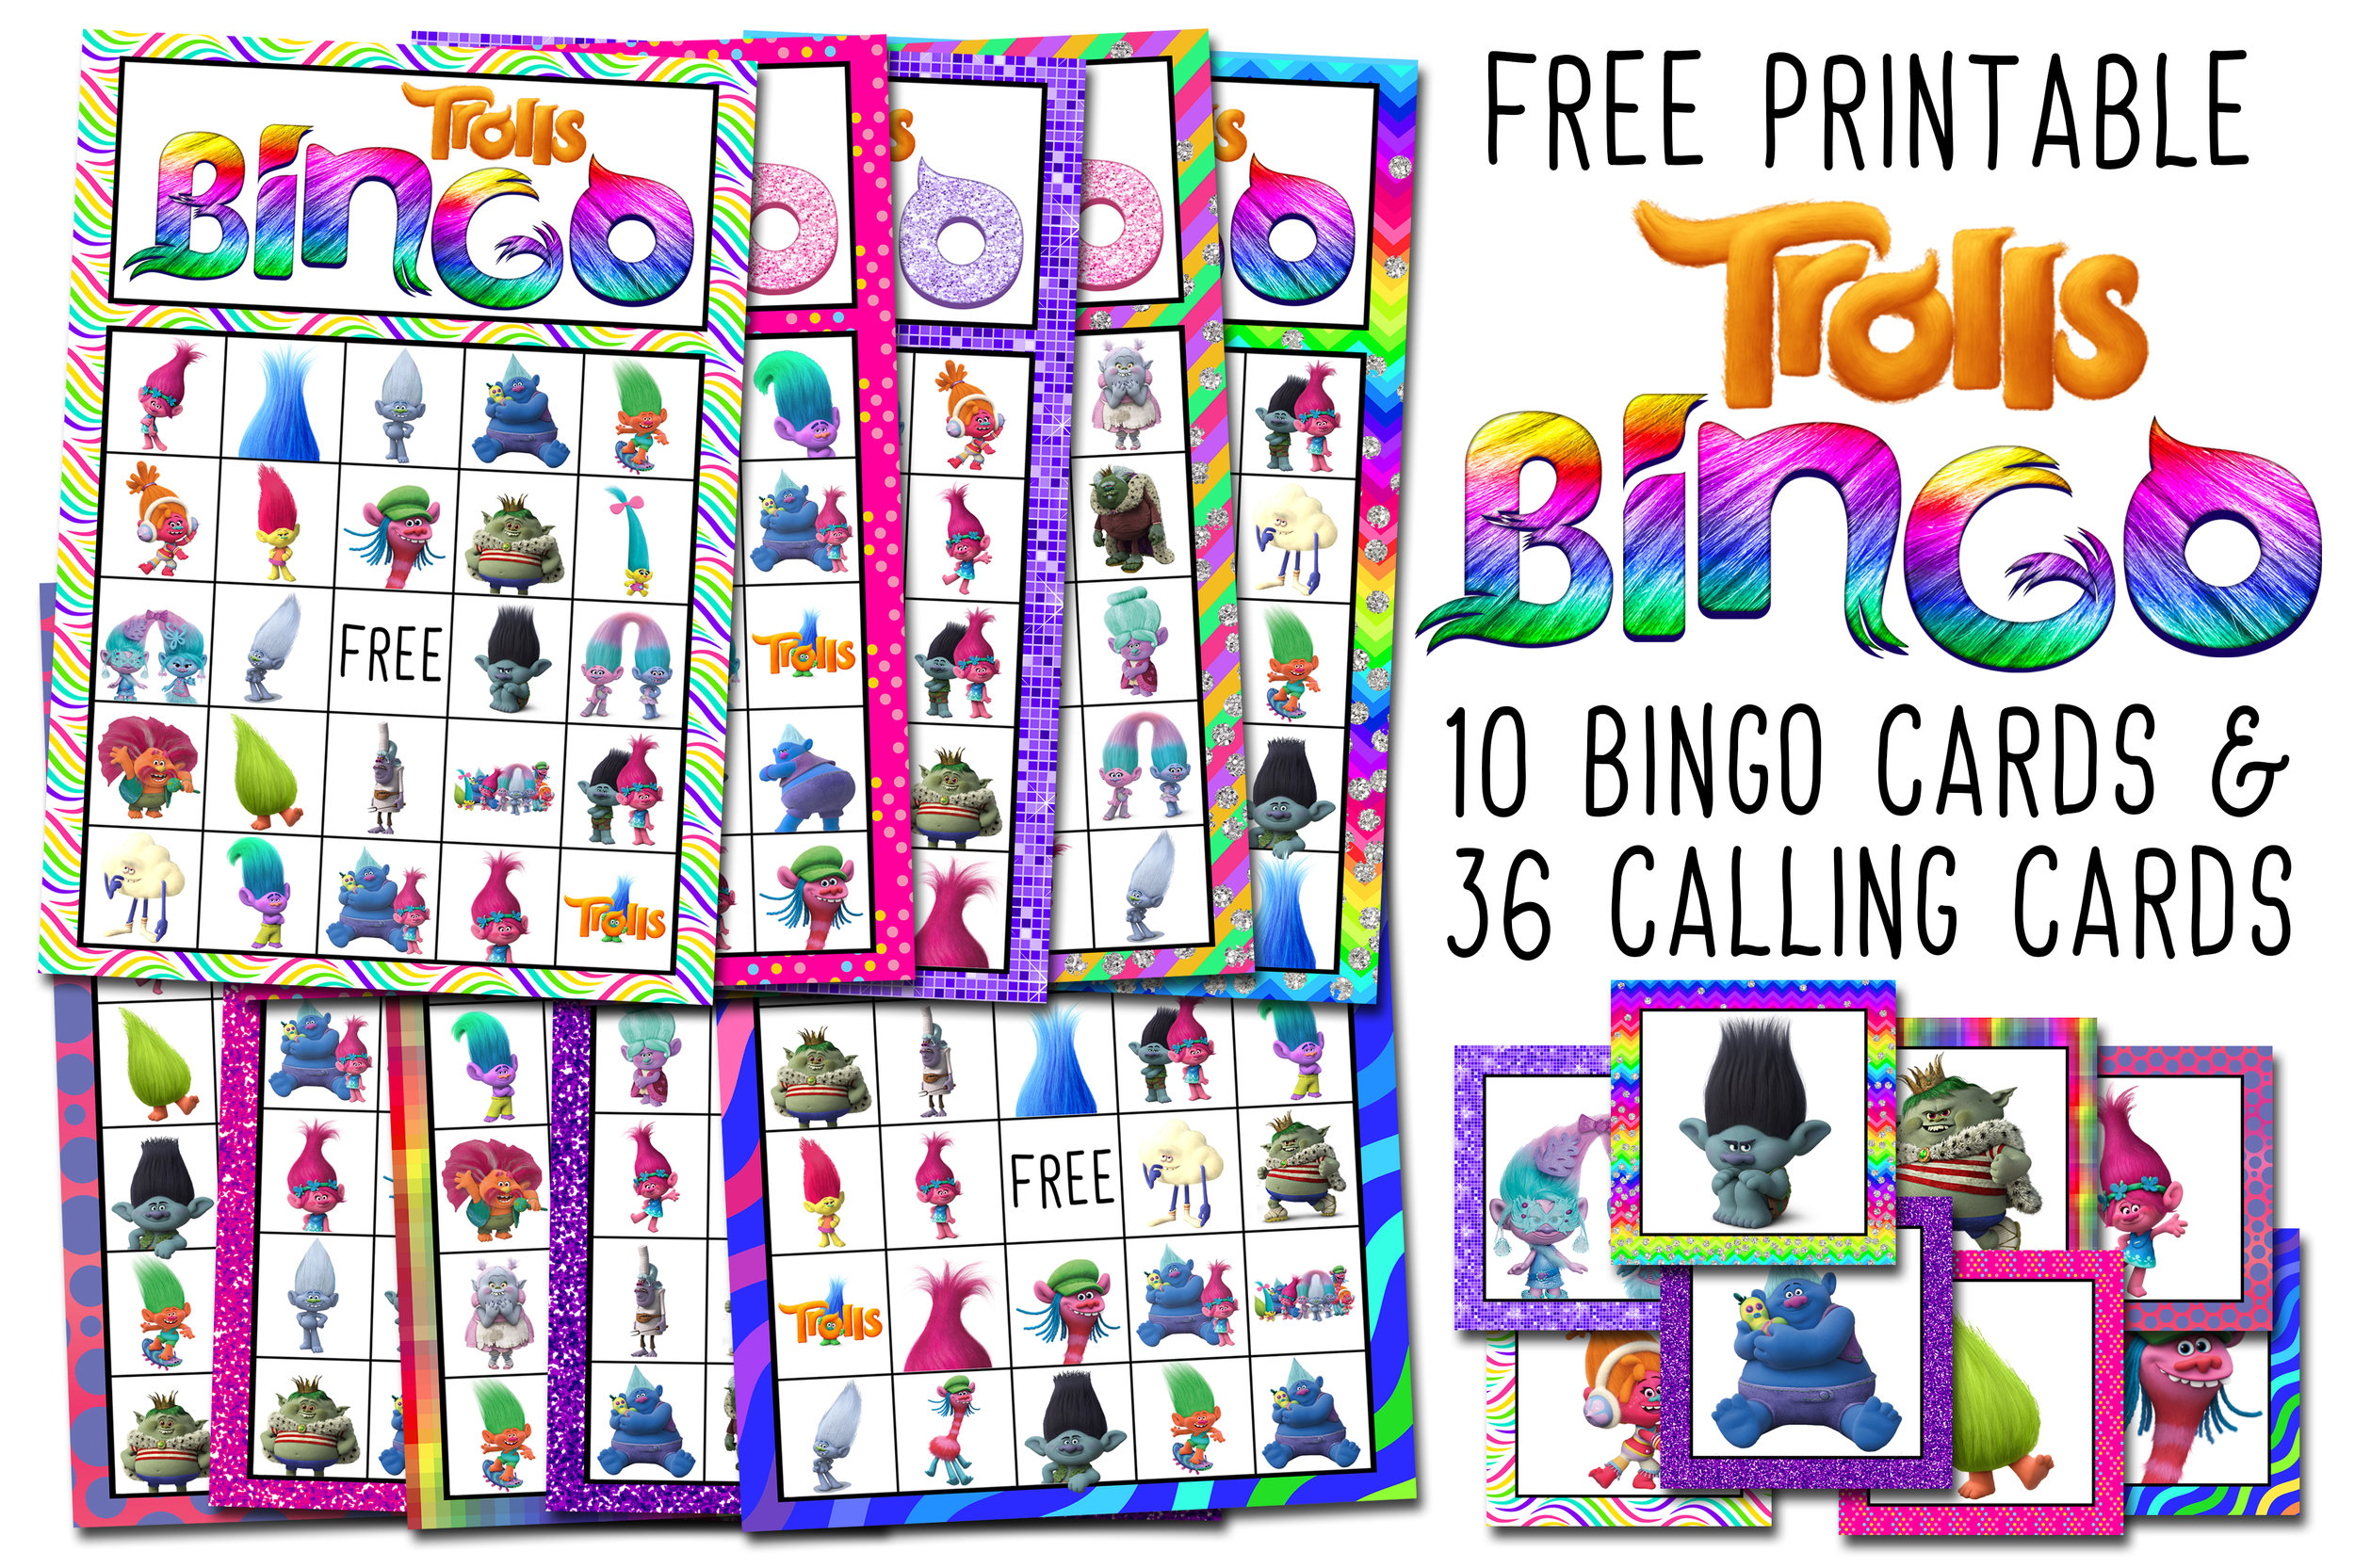 Trolls Free Printable Bingo Cards Trolls Birthday Party